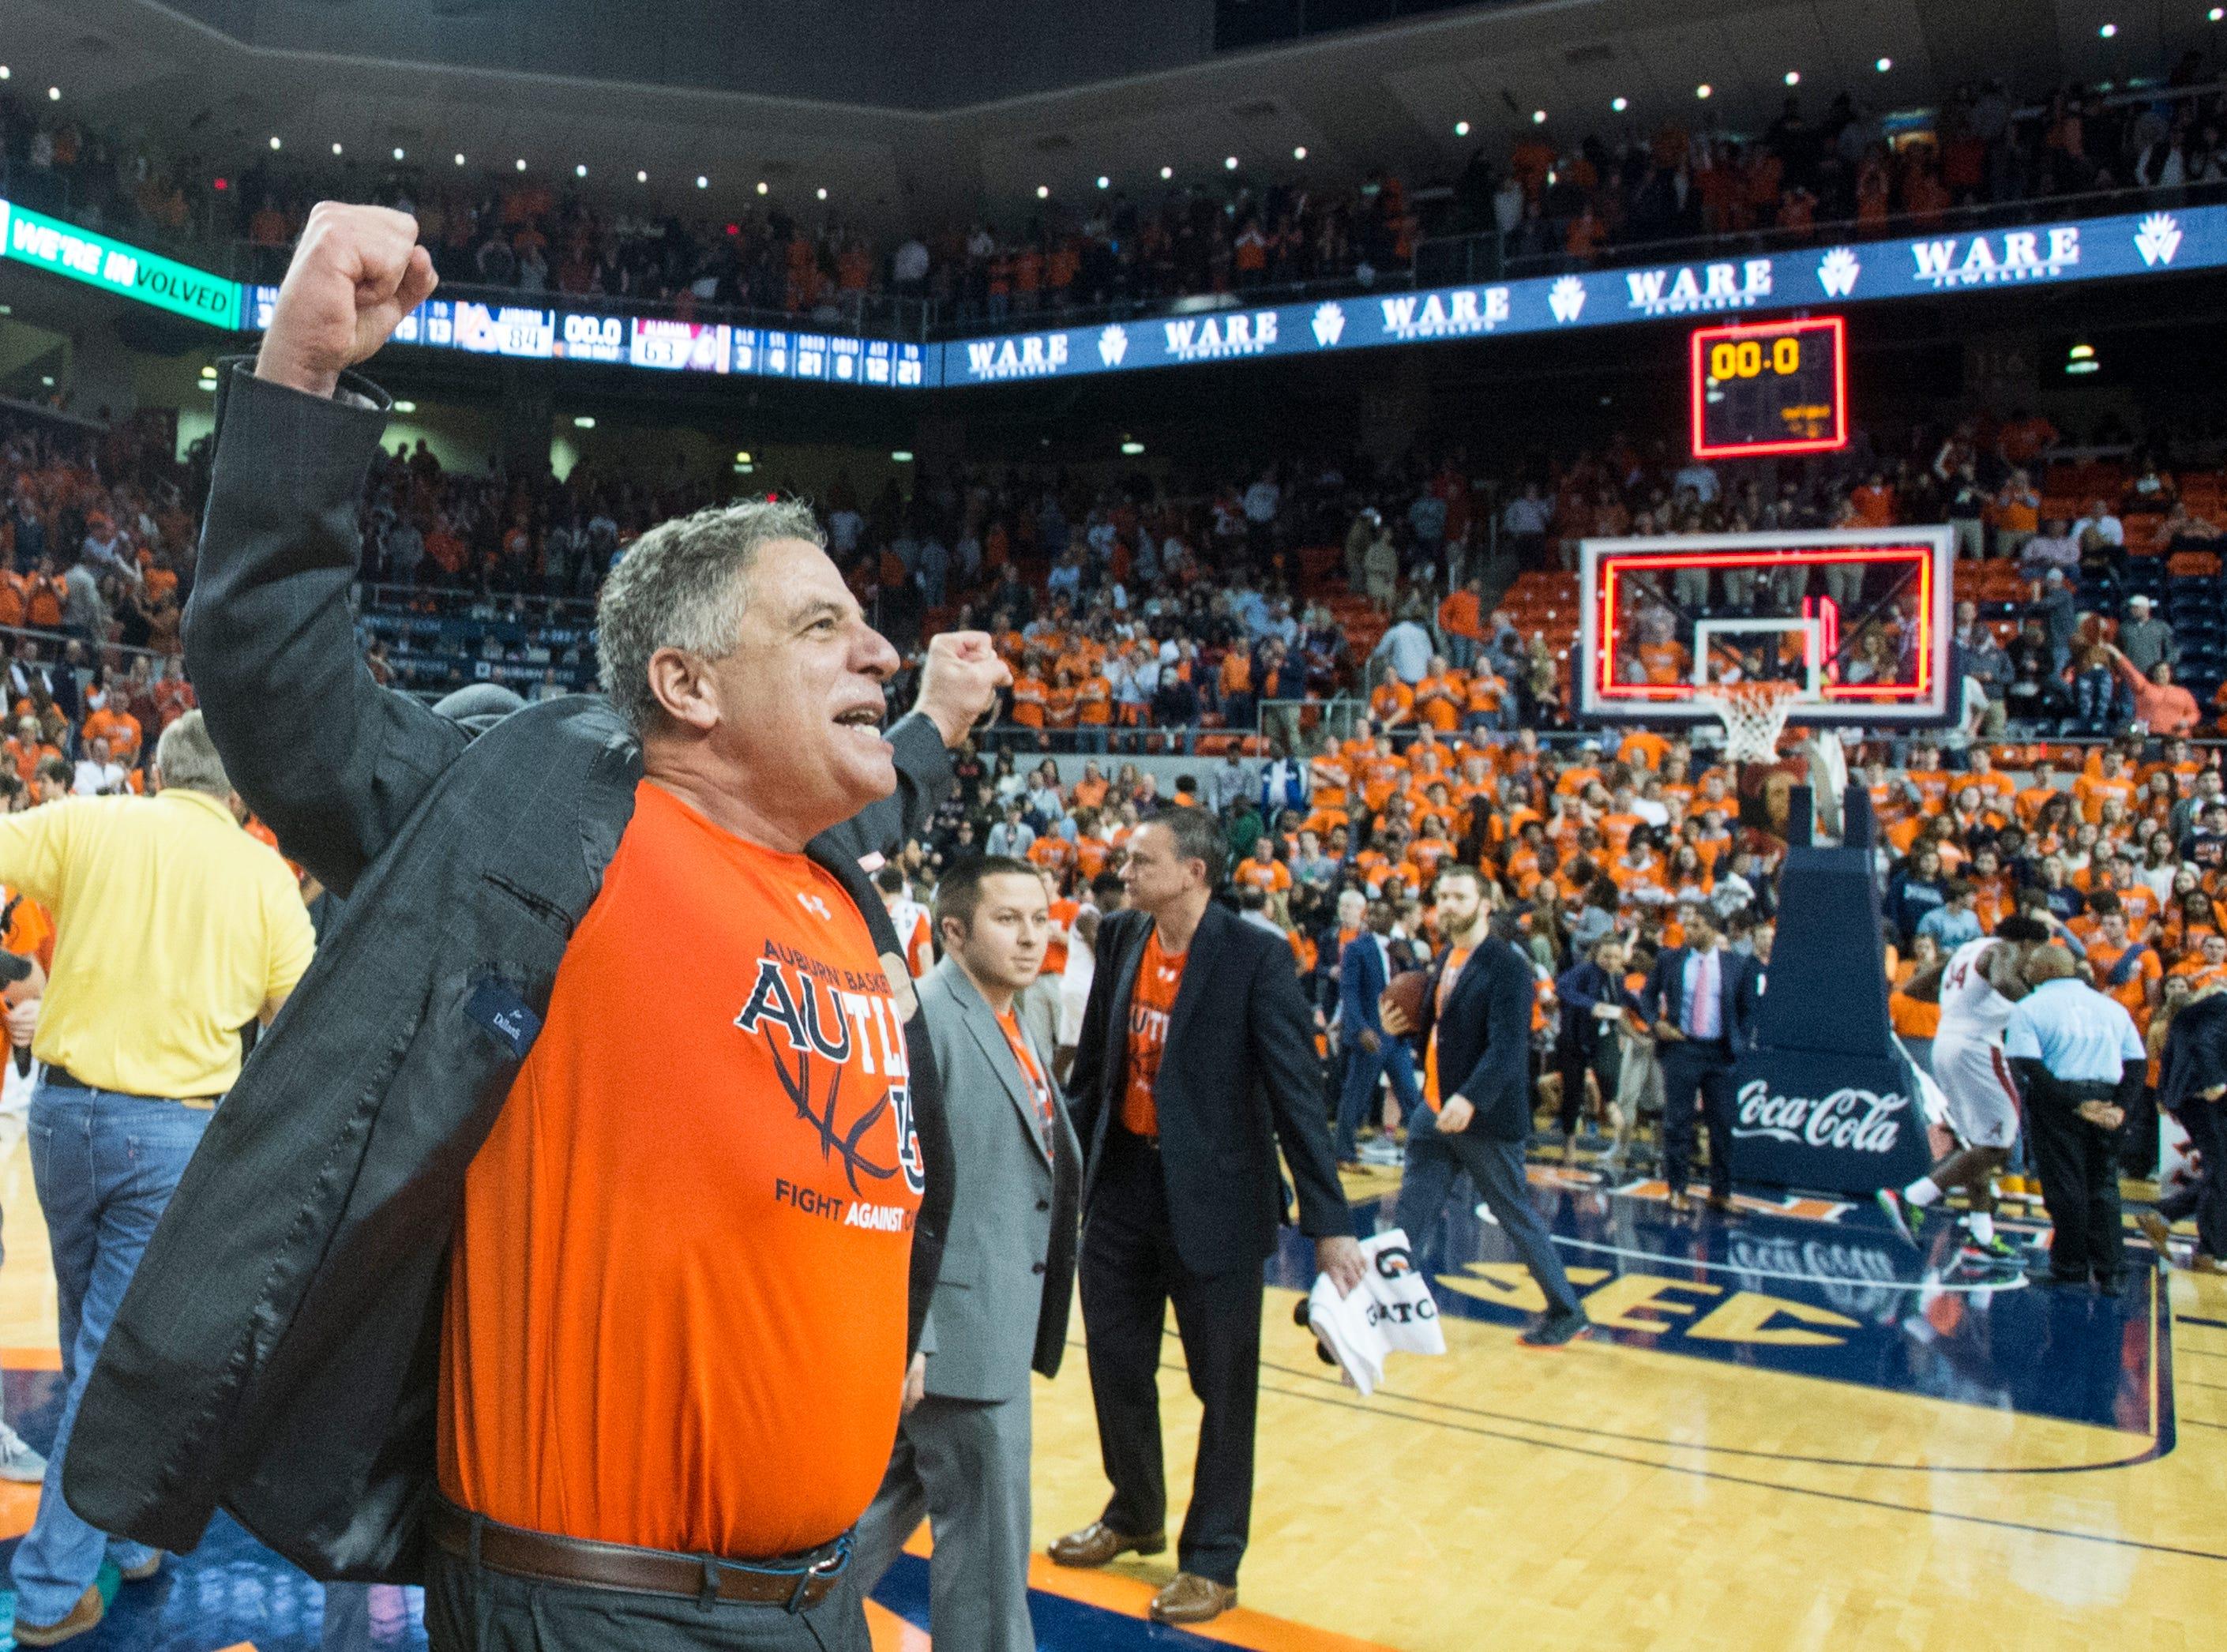 Auburn head coach Bruce Pearl reacts after the game at Auburn Arena in Auburn, Ala., on Saturday, Feb. 2, 2019. Auburn defeated Alabama 84-63.